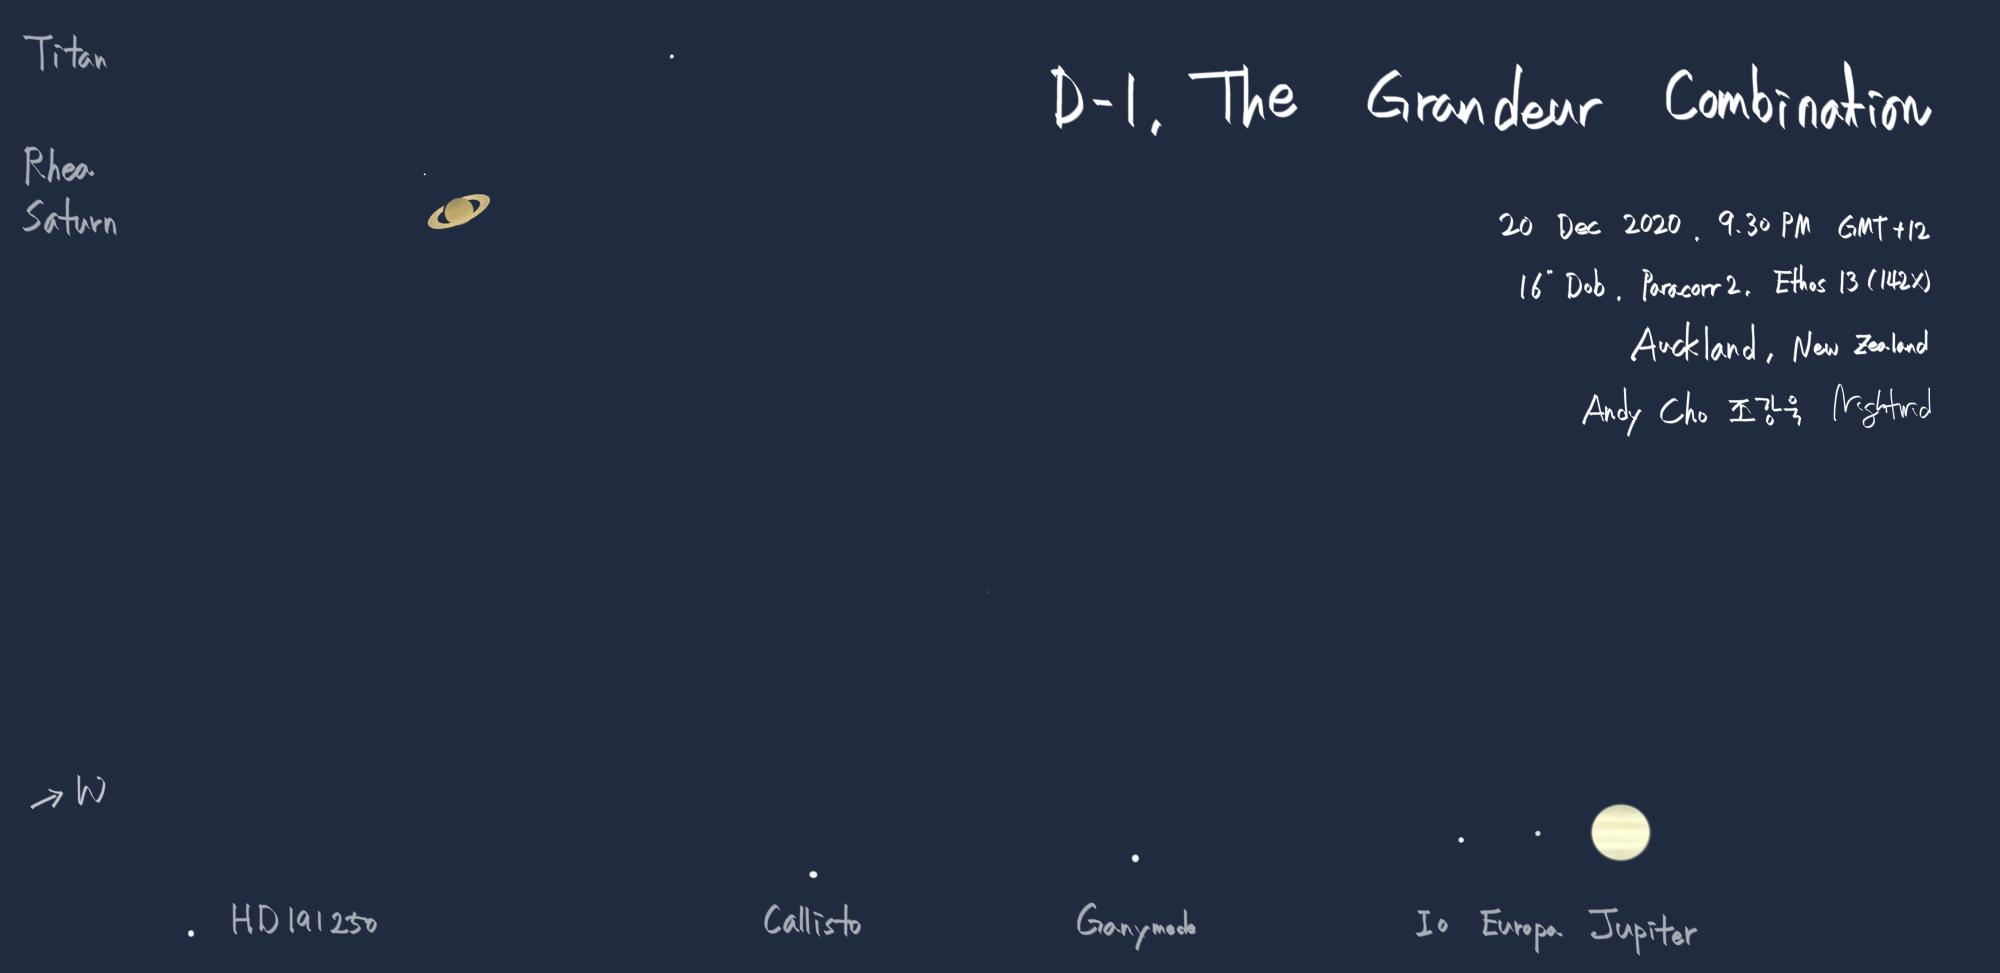 2000_D-1, The Grandeur Combination 20 December 2020.png